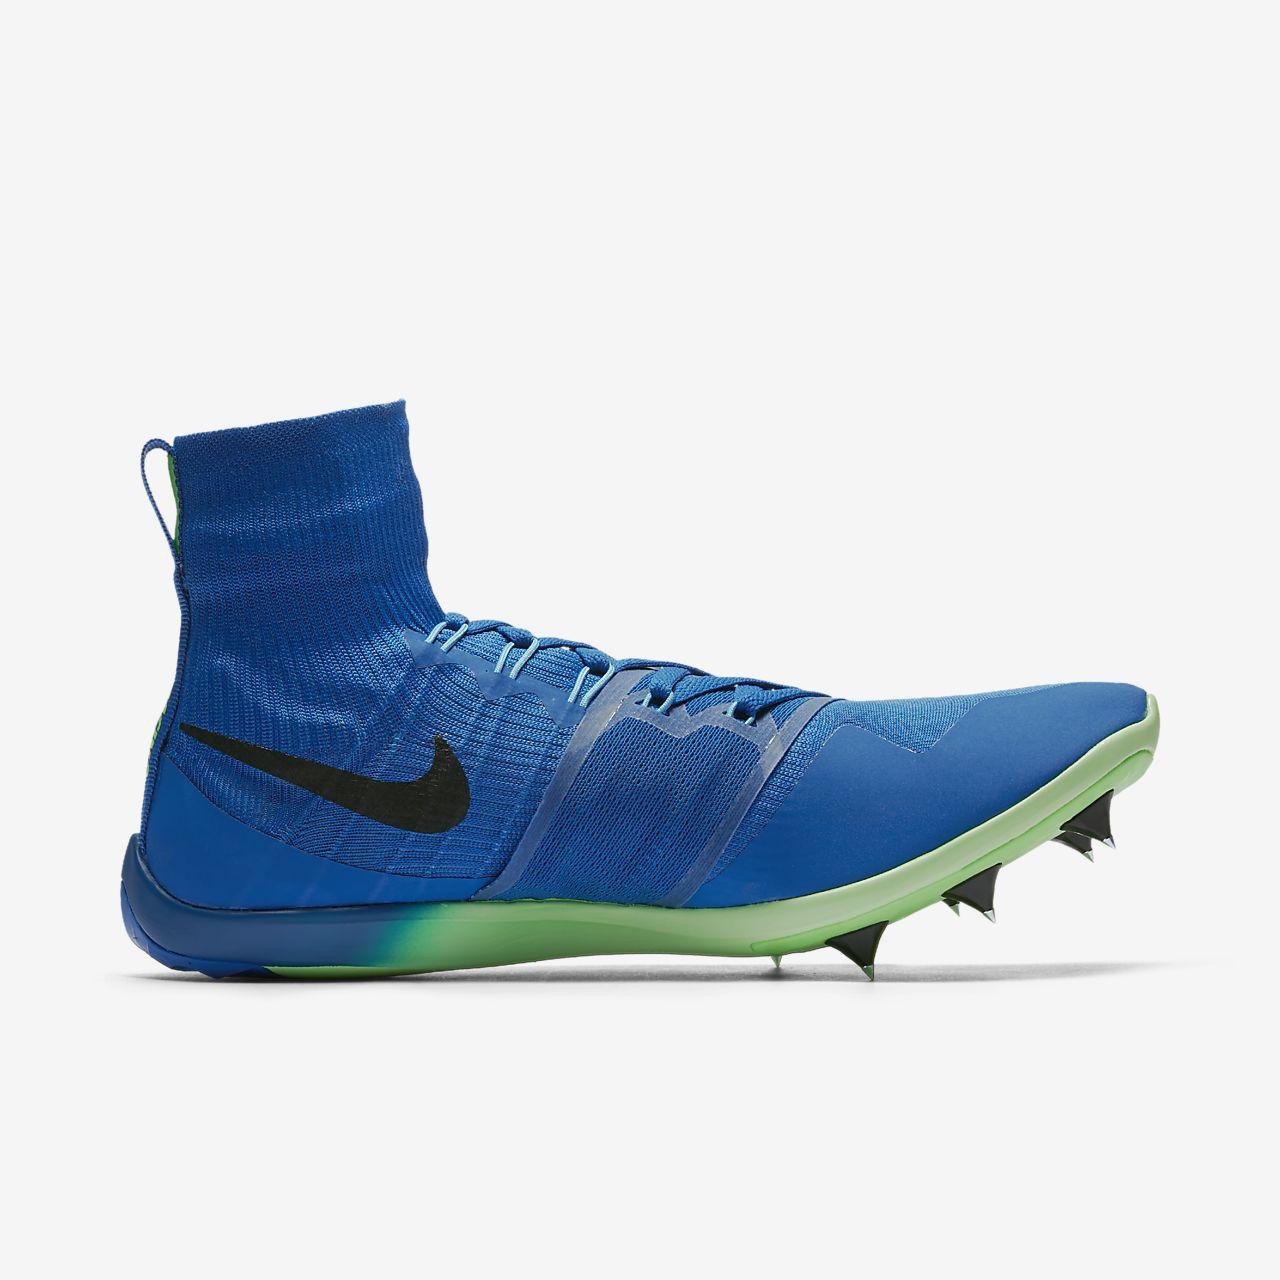 ... Nike Zoom Victory 4 XC Unisex Track Spike